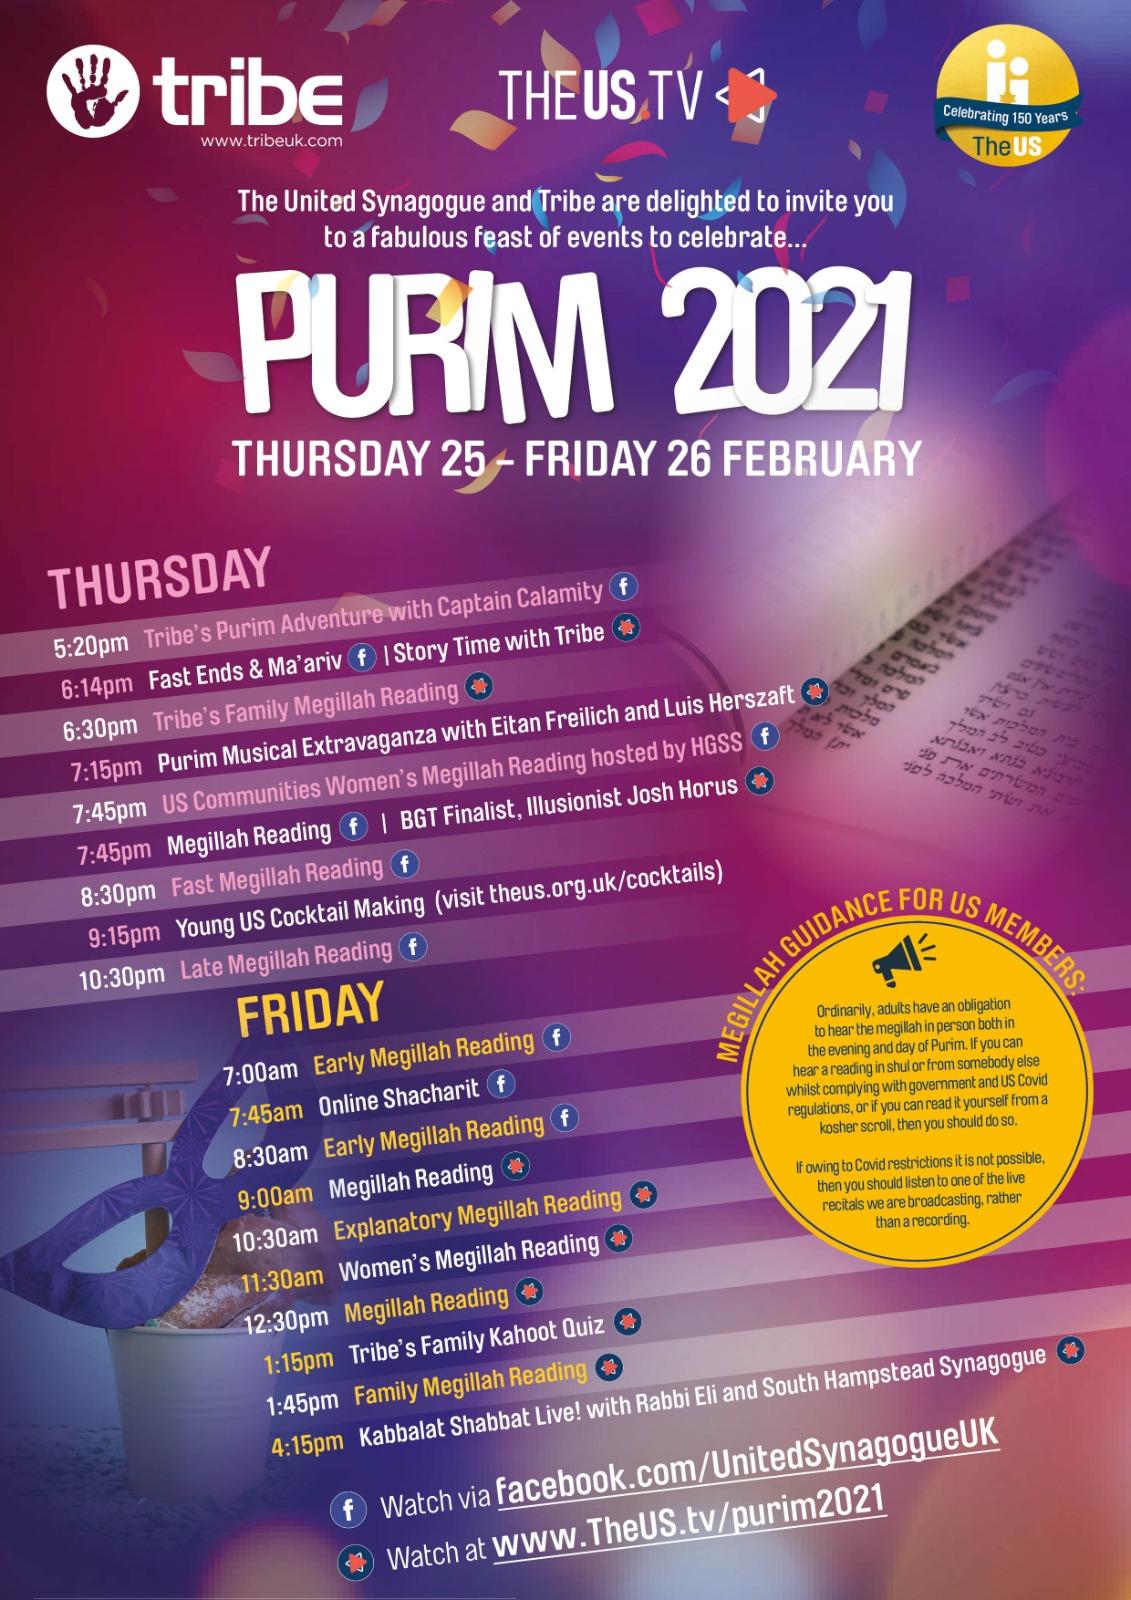 Purim 2021 live online